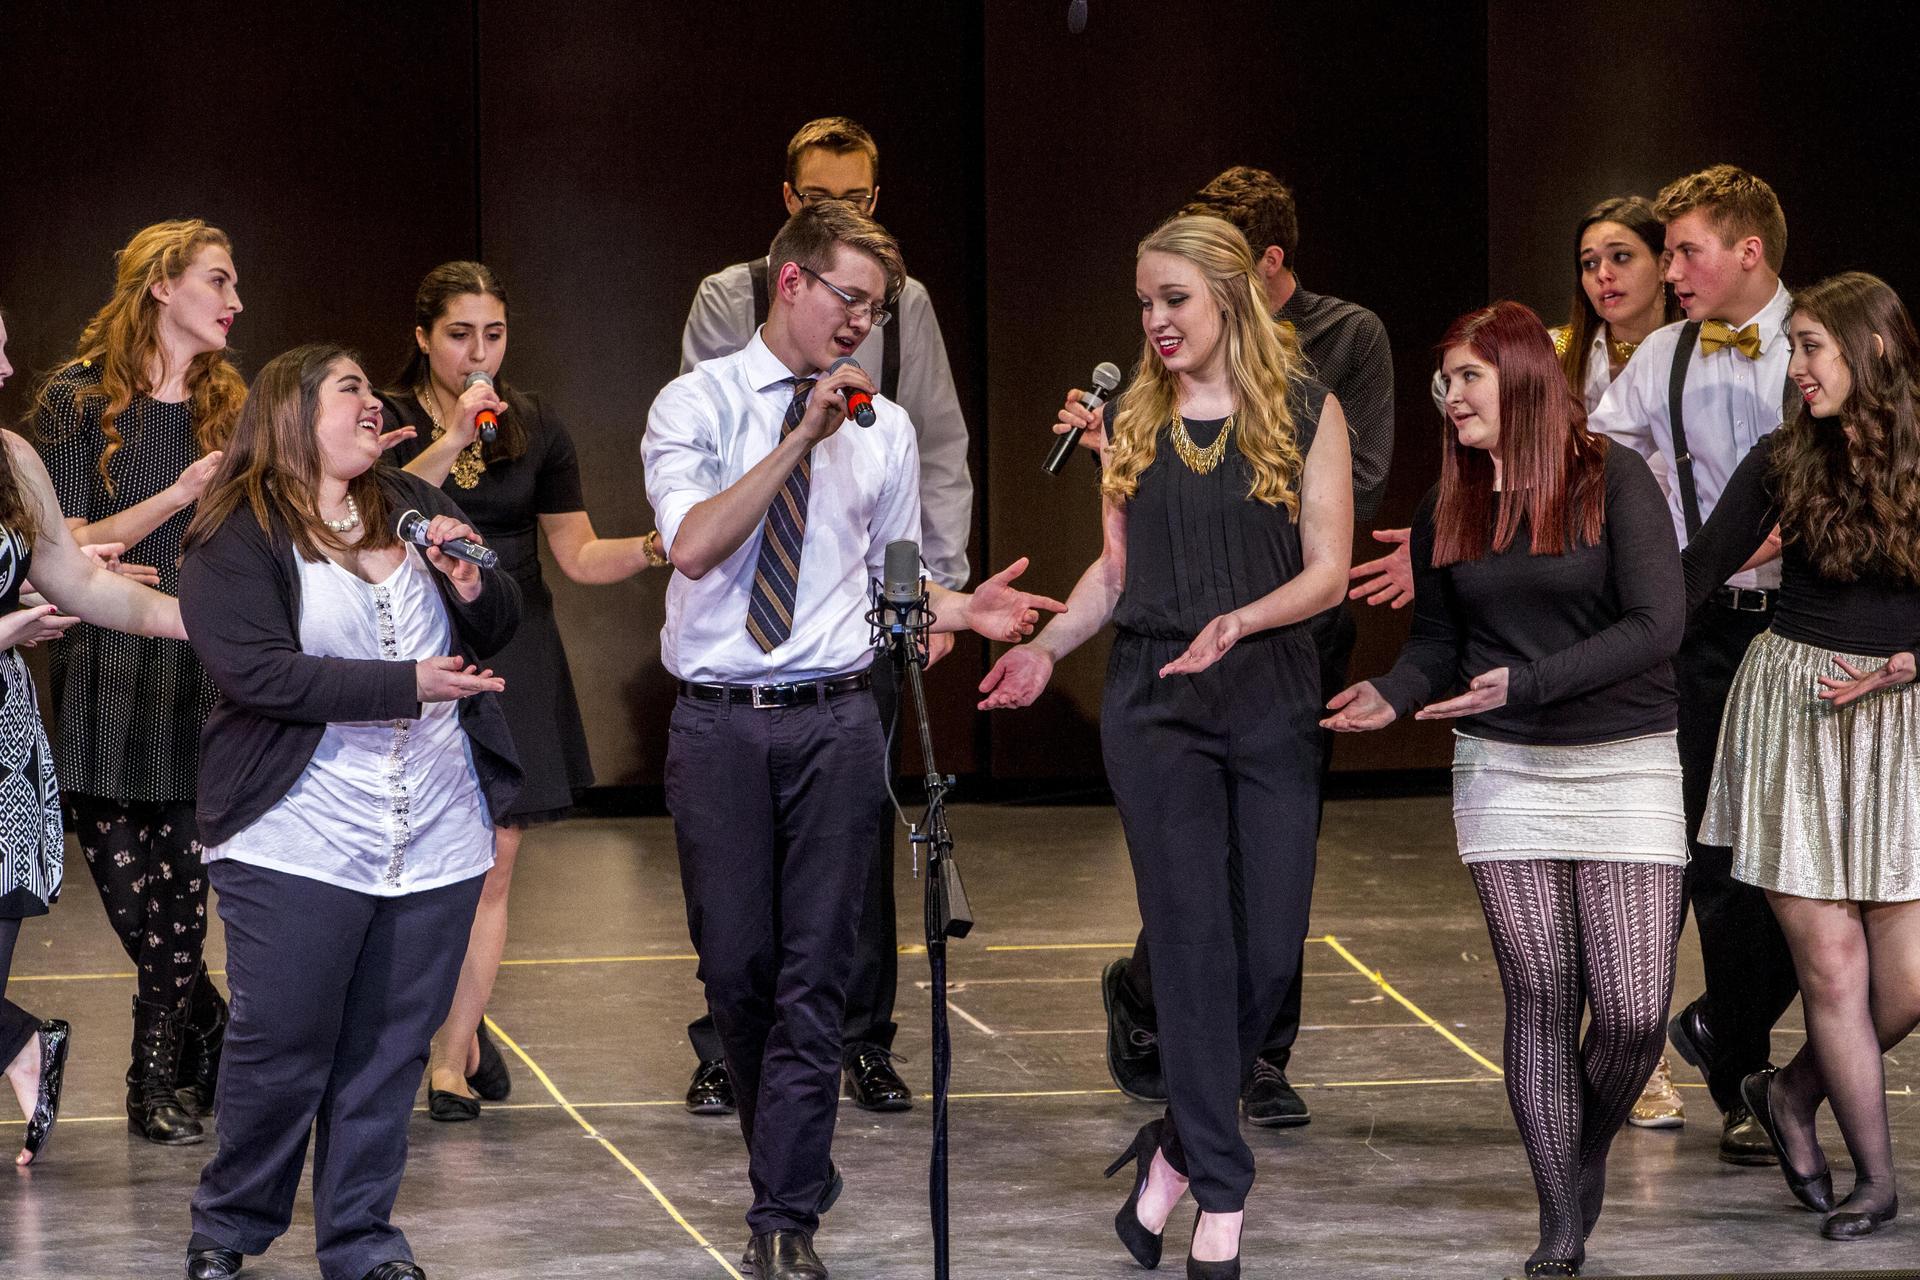 Trebels perform at Variety Show